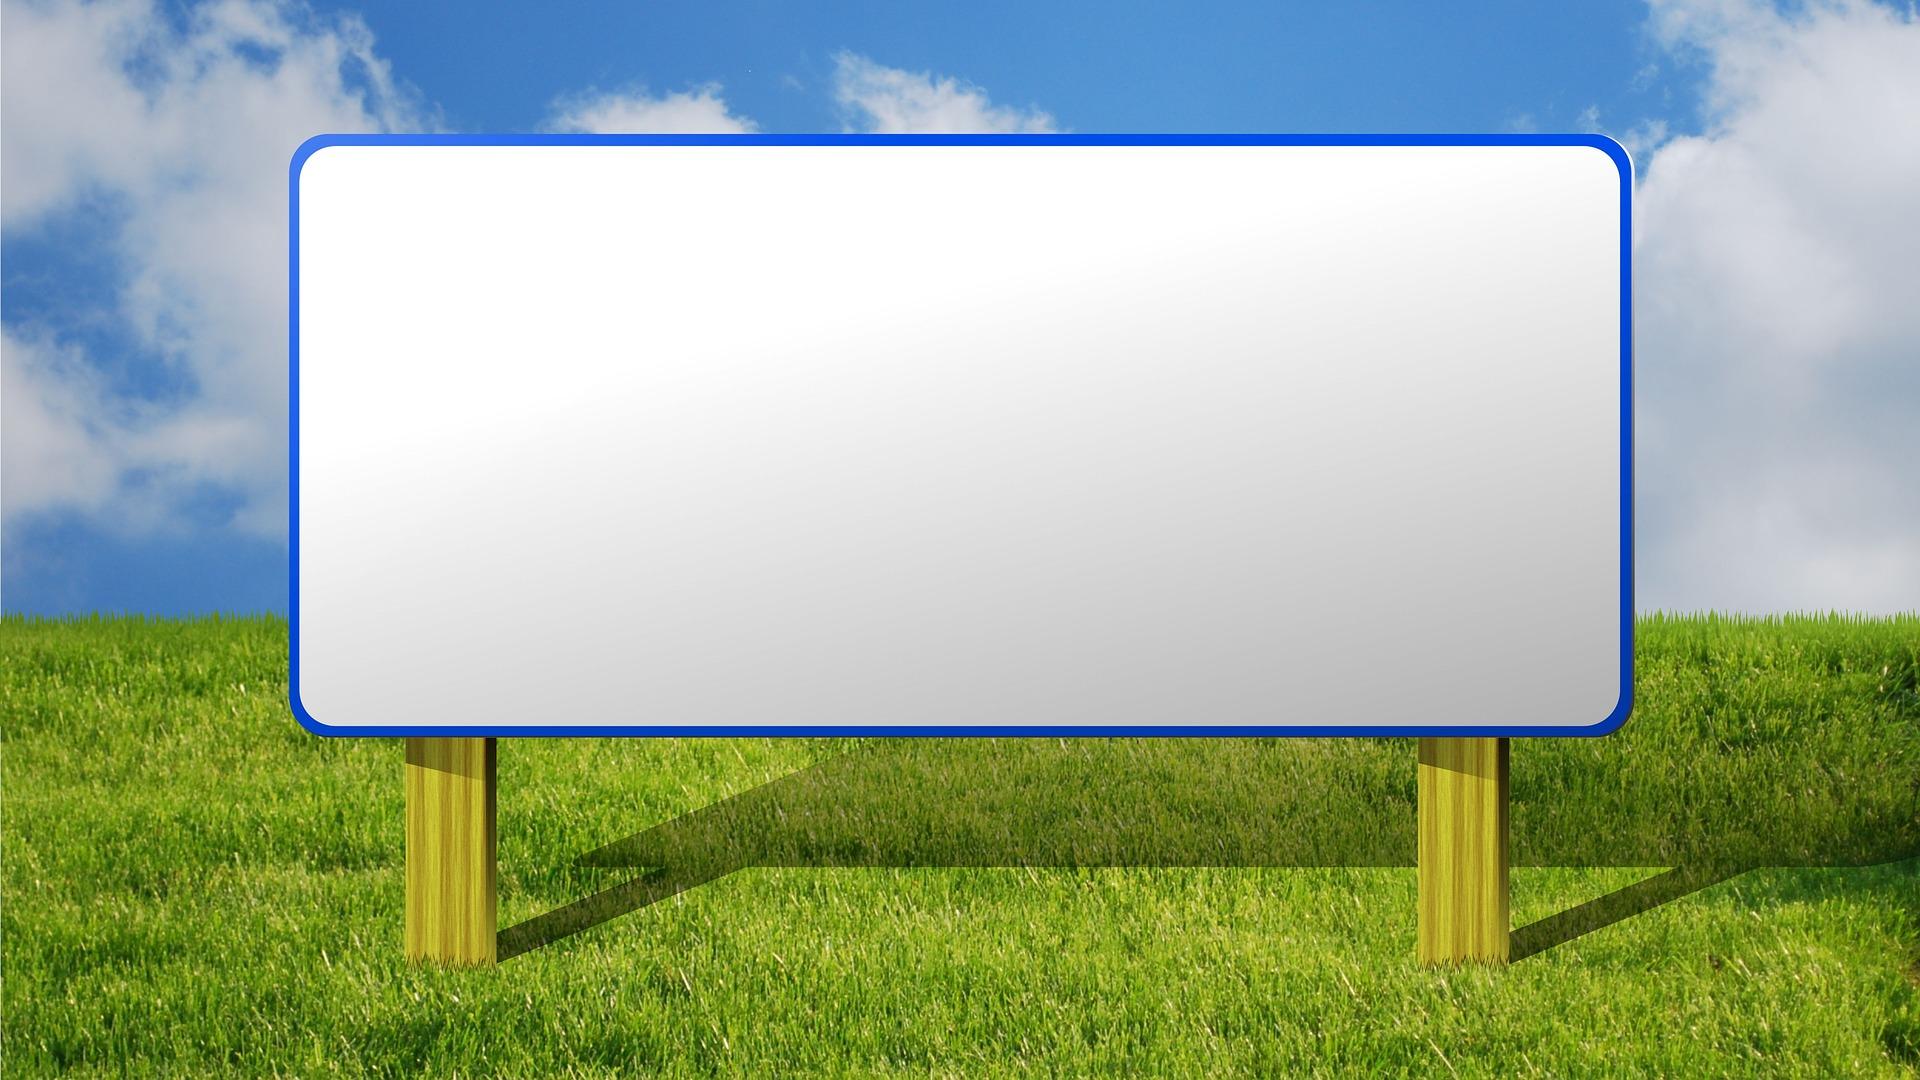 A blank billboard image: